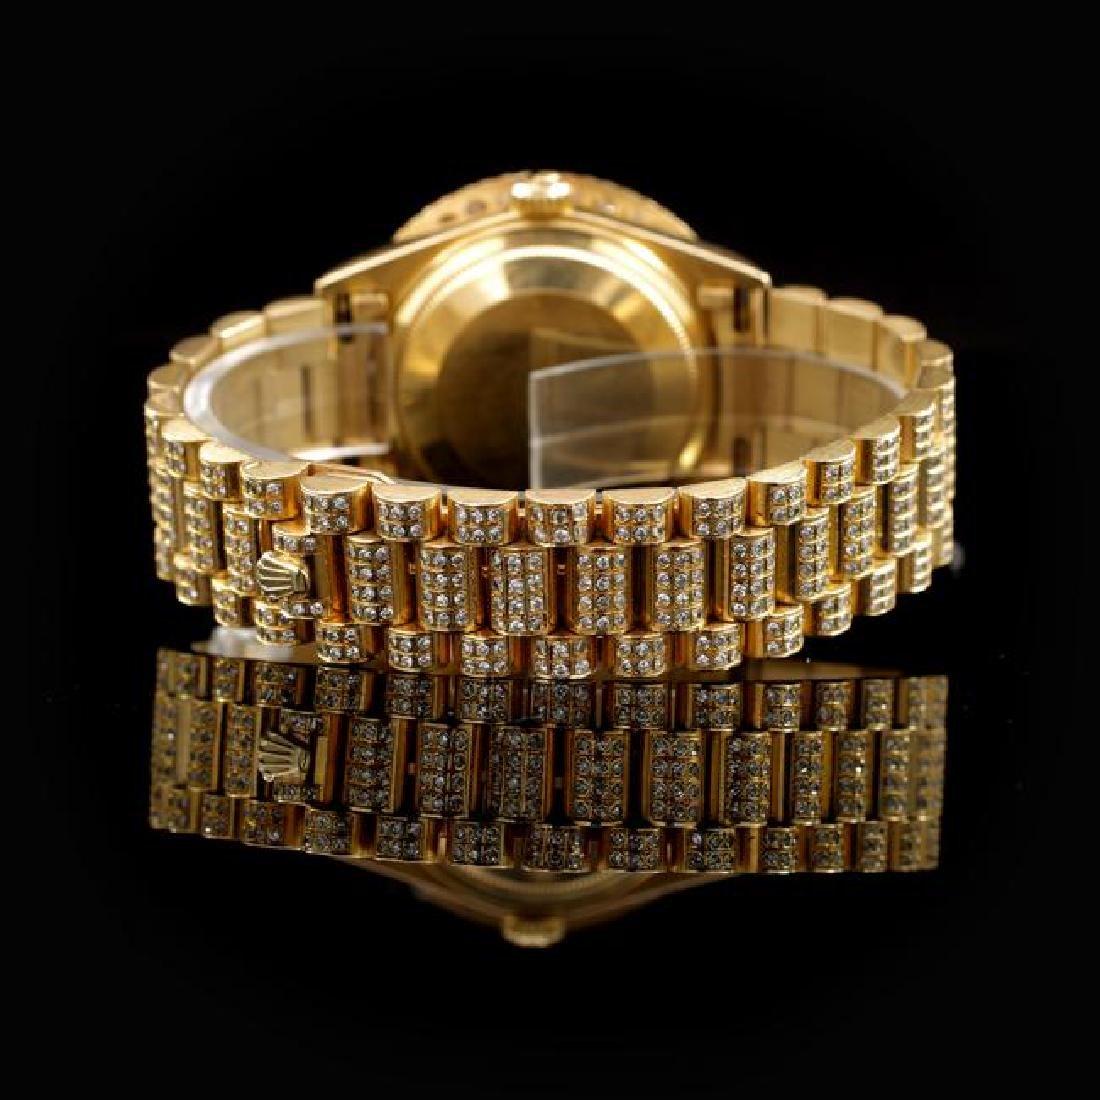 Rolex Day-Date 36mm Yellow Gold Mens Diamond Wristwatch - 3